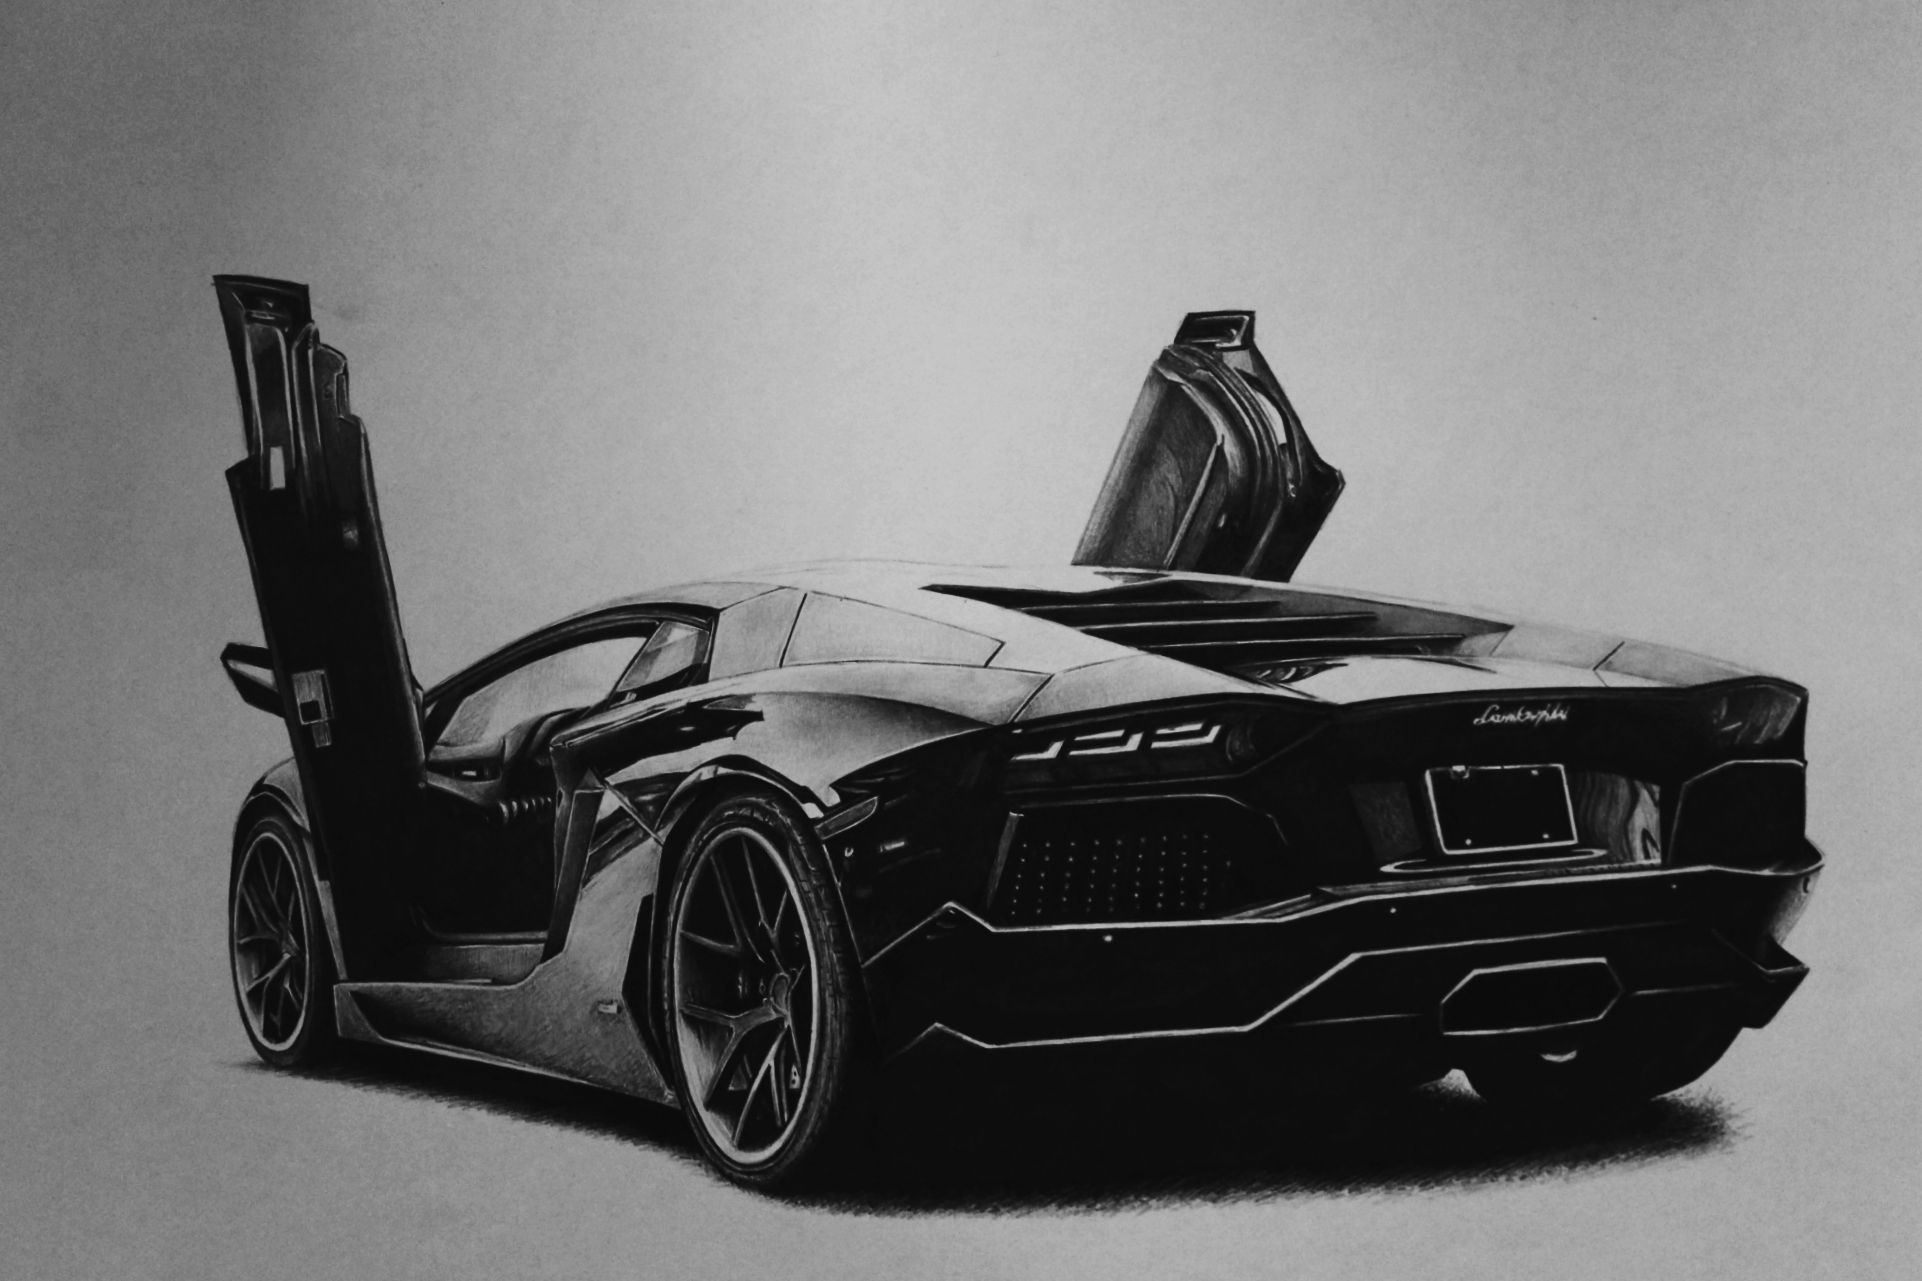 lamborghini aventador black and white drawing. lamborghini aventador draw by tolleam black and white drawing